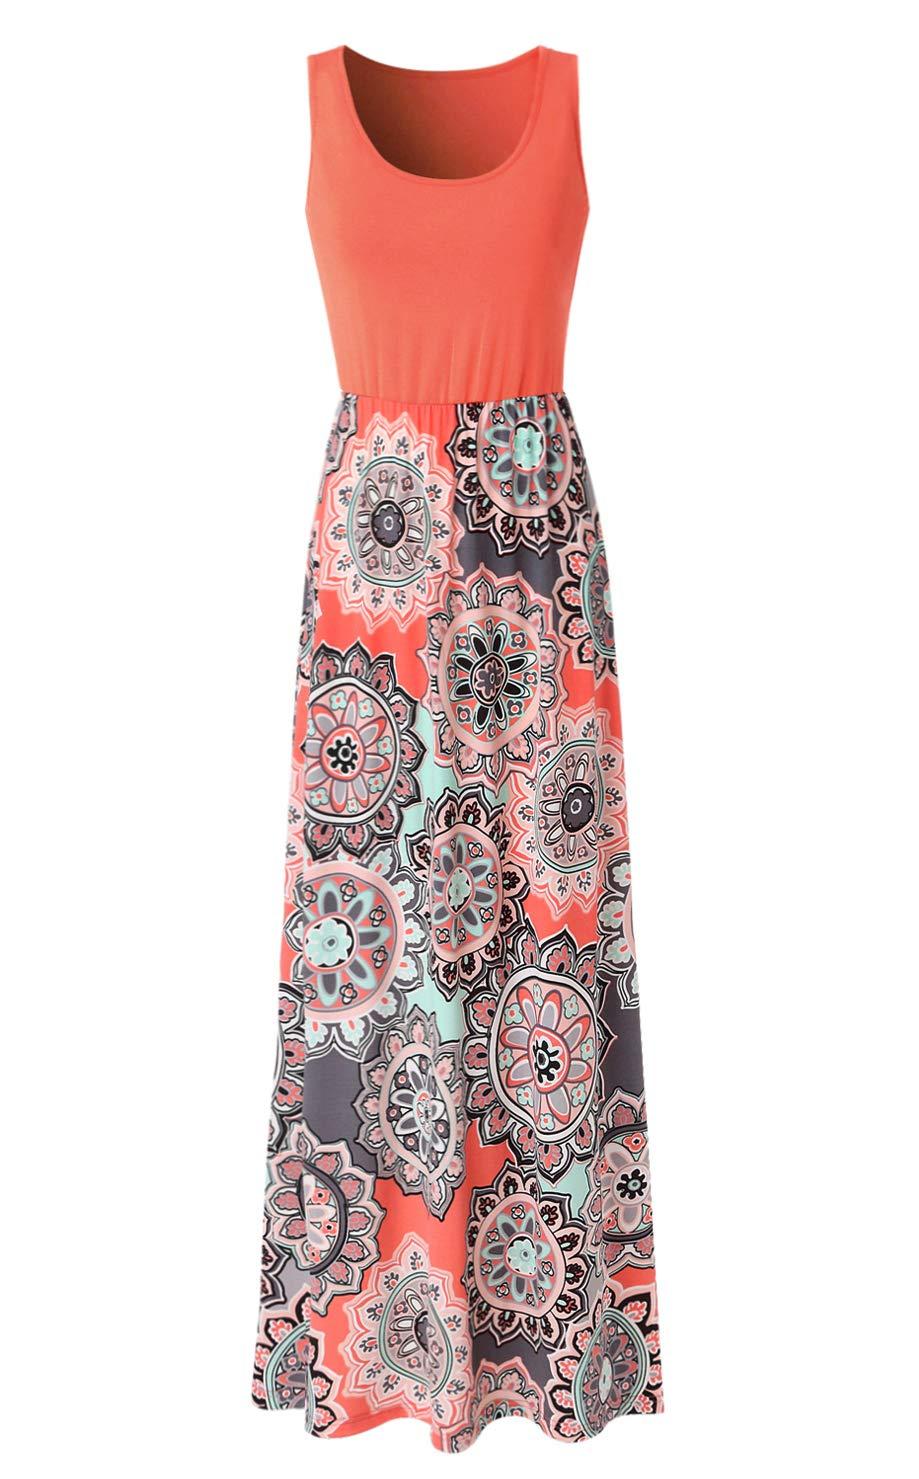 ef4b81fd325 Zattcas Womens Summer Contrast Sleeveless Tank Top Floral Print Maxi Dress  product image